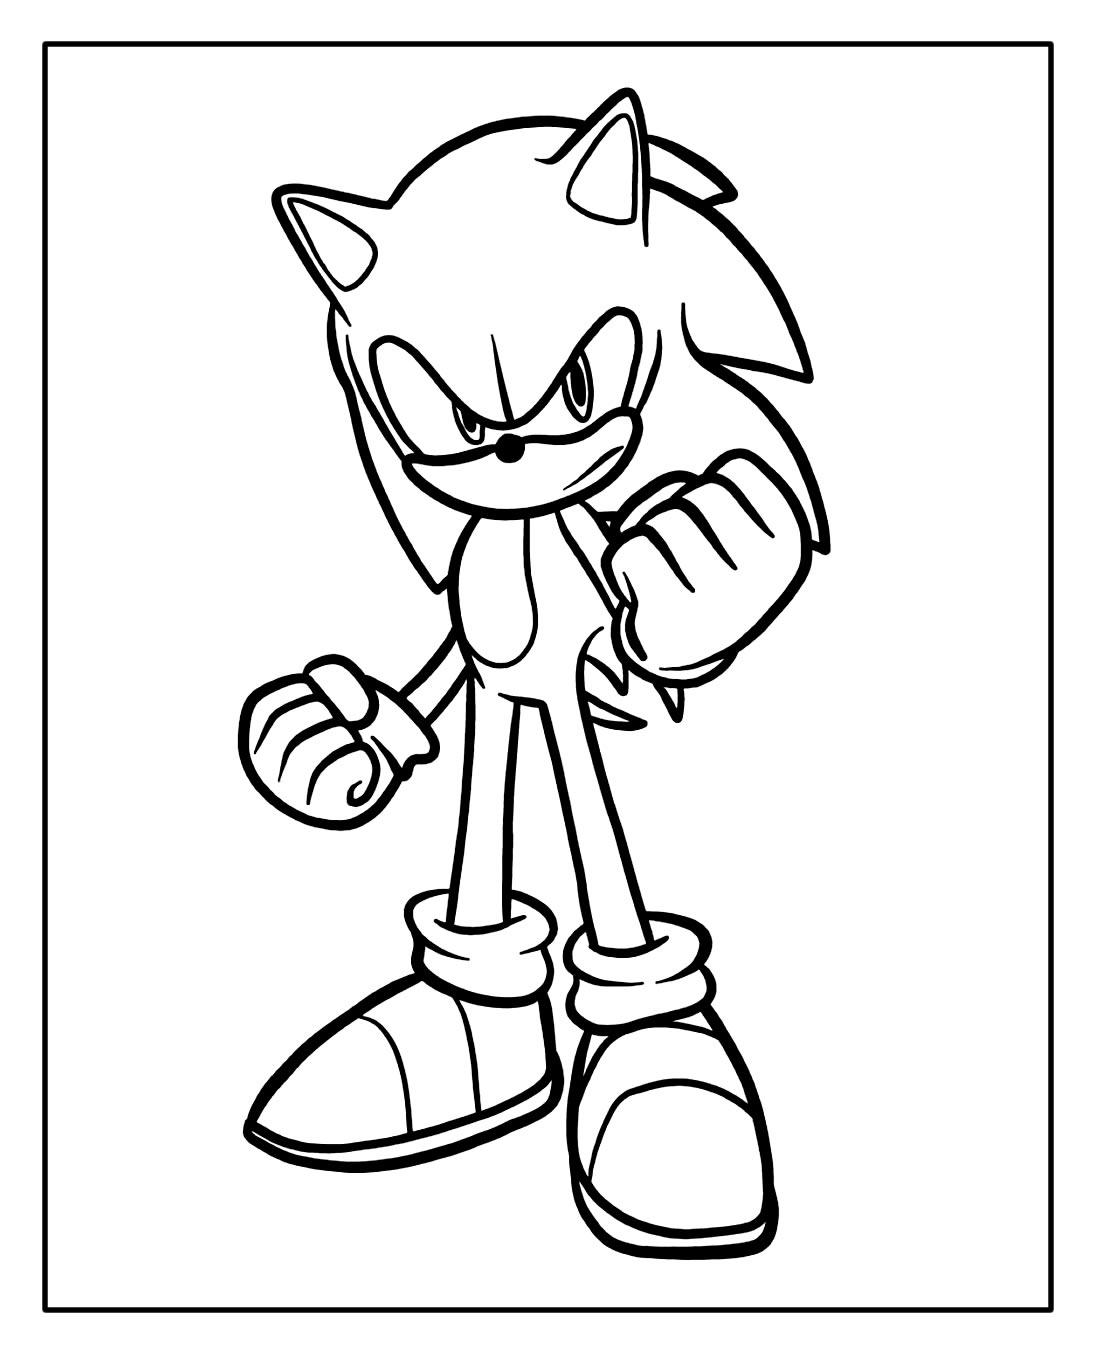 Desenho para colorir Sonic